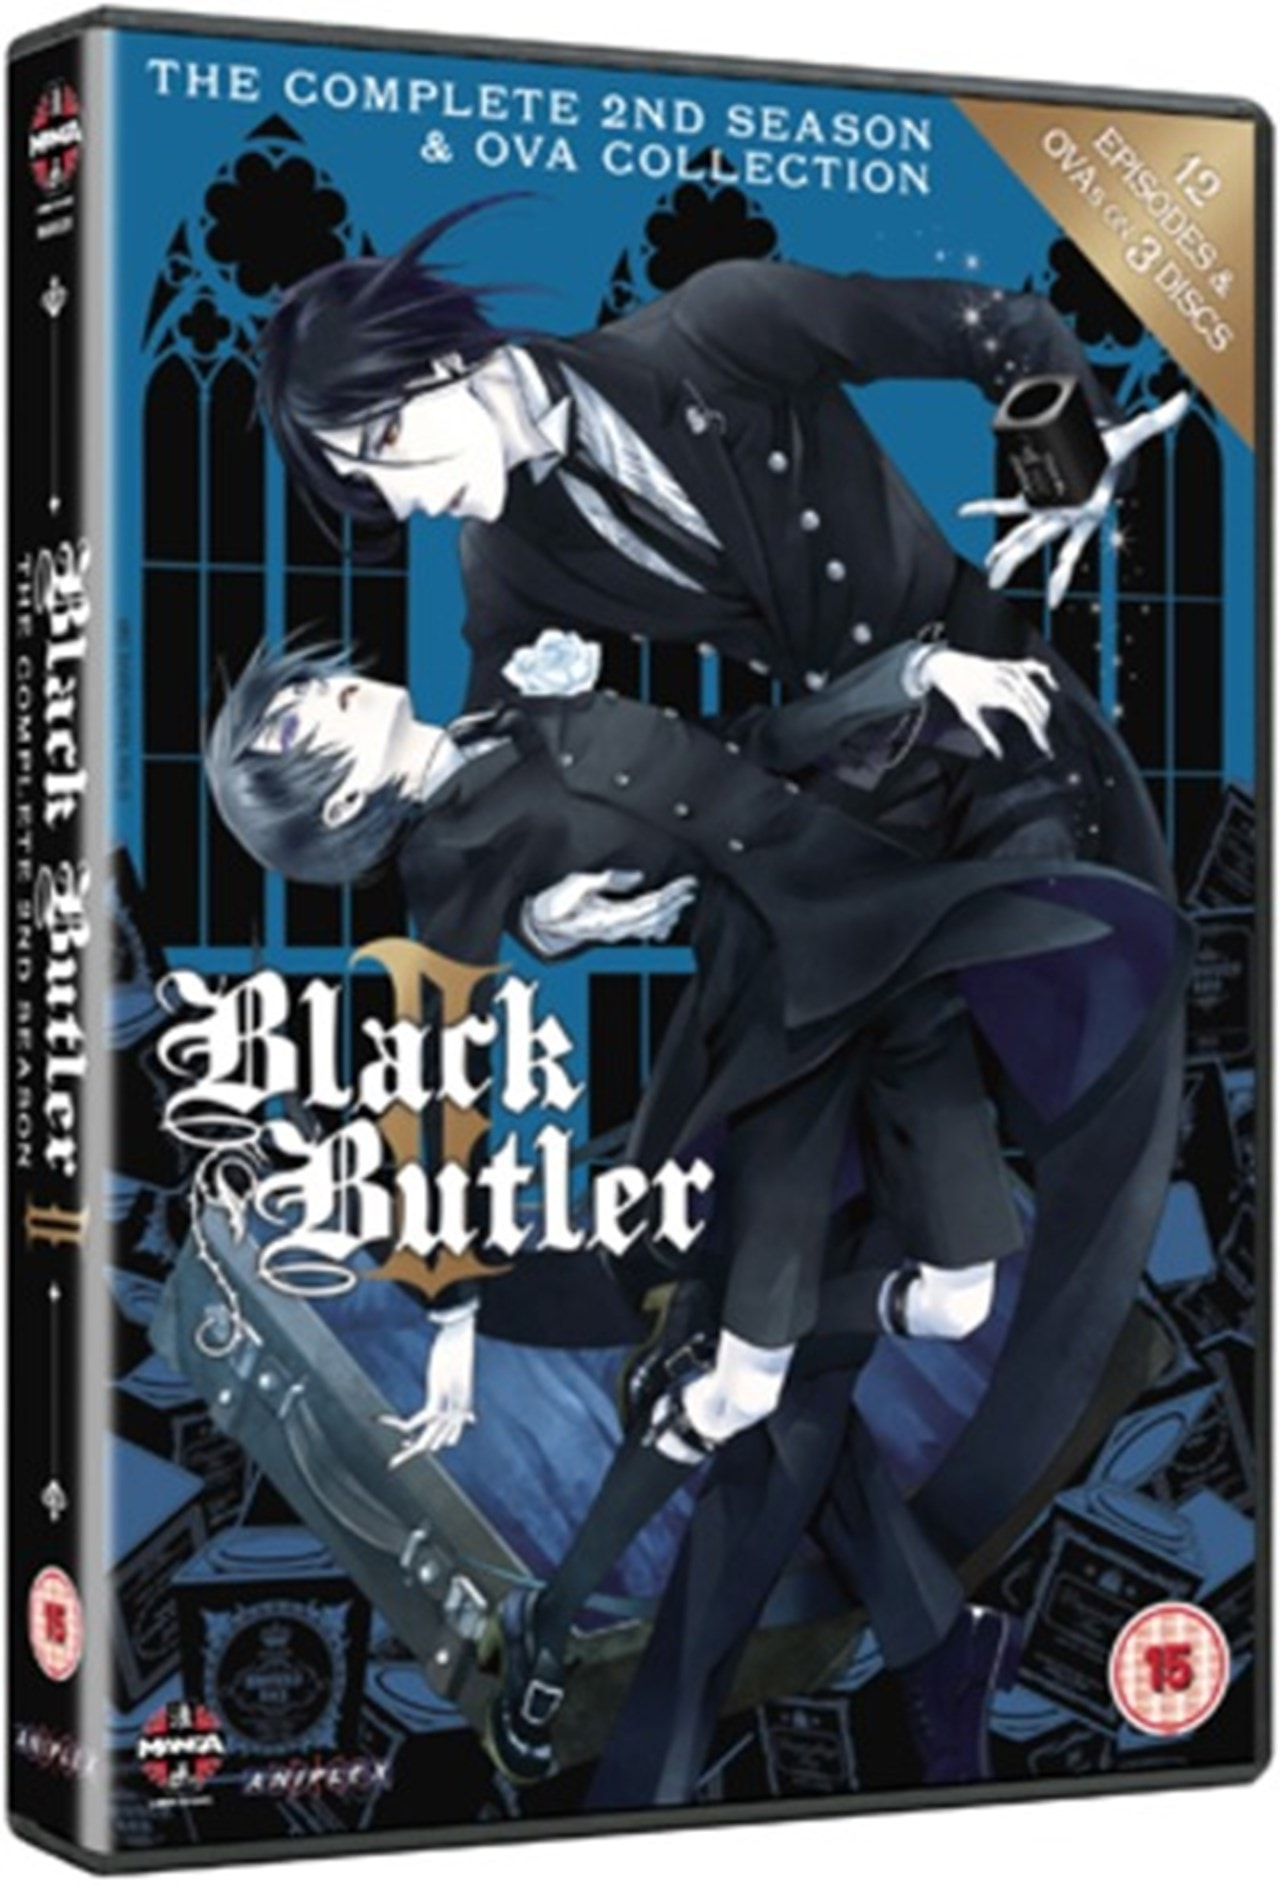 Black Butler: The Complete Second Season - 1